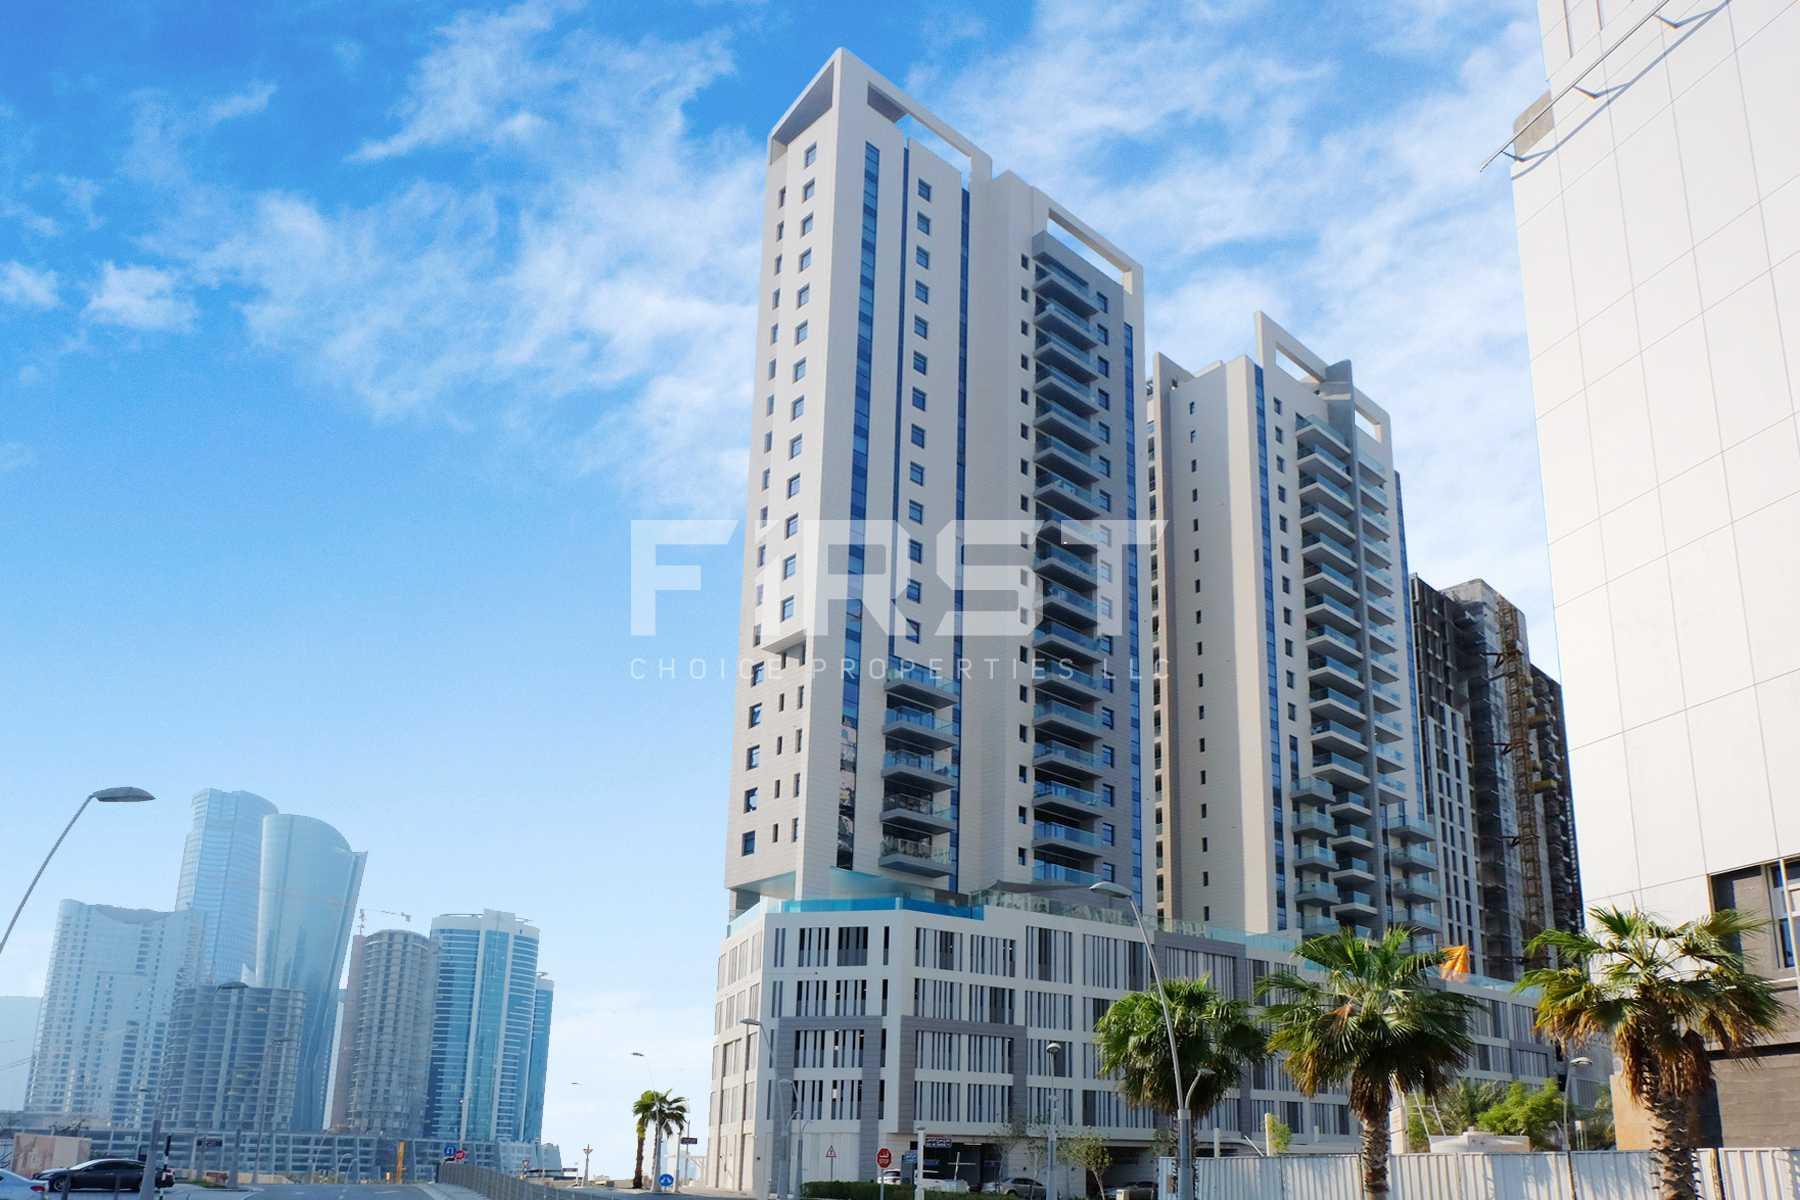 External Photo of Parkside Residence Shams Abu Dhabi UAE (8).jpg